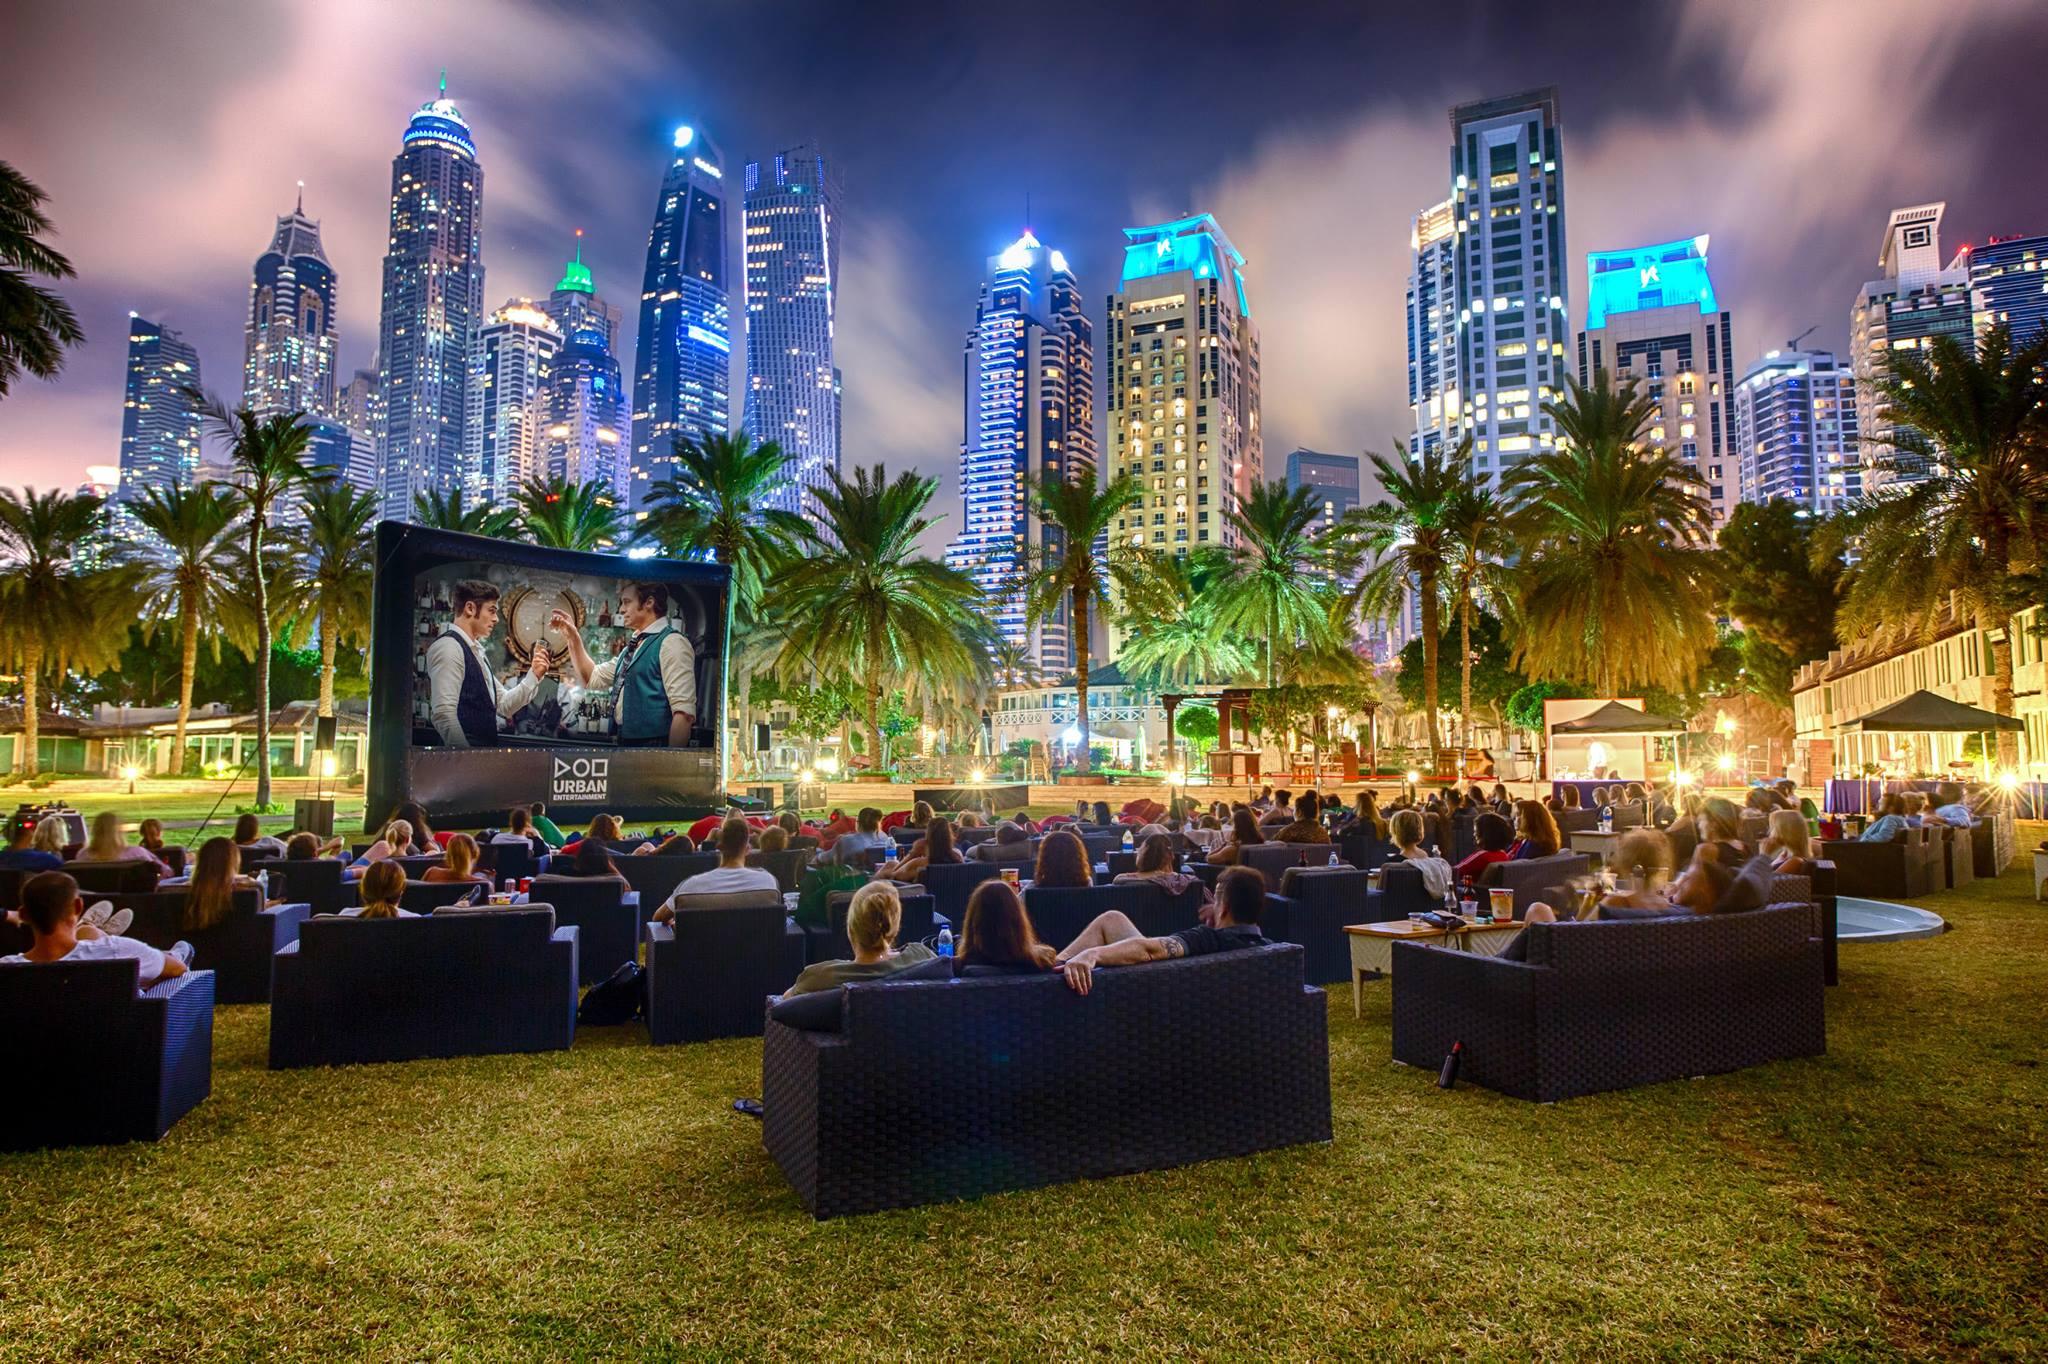 Urban Outdoor Cinema Is Coming To Dubai Marina This October